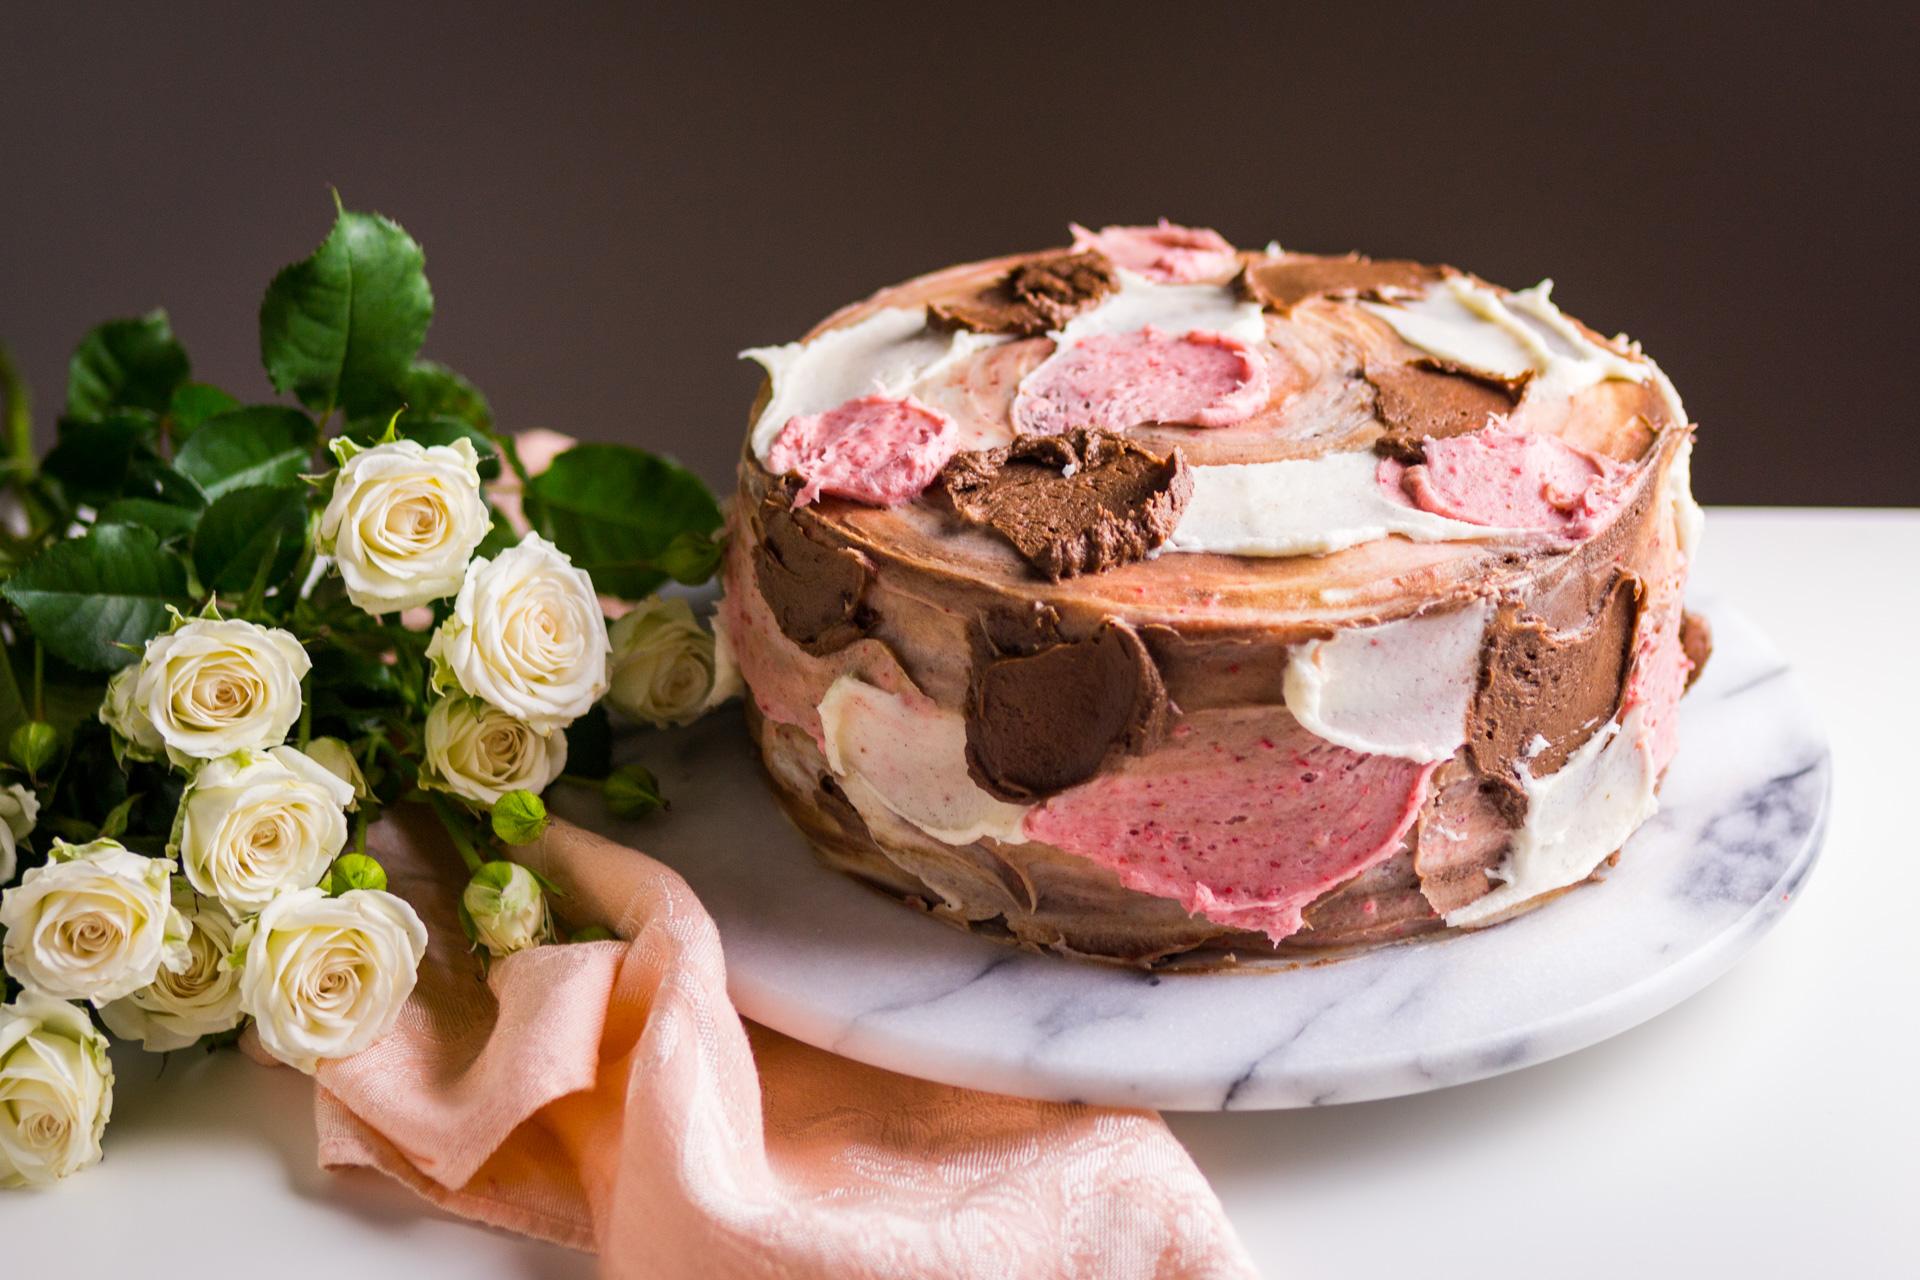 neapolitan-checkered-cake-6.jpg